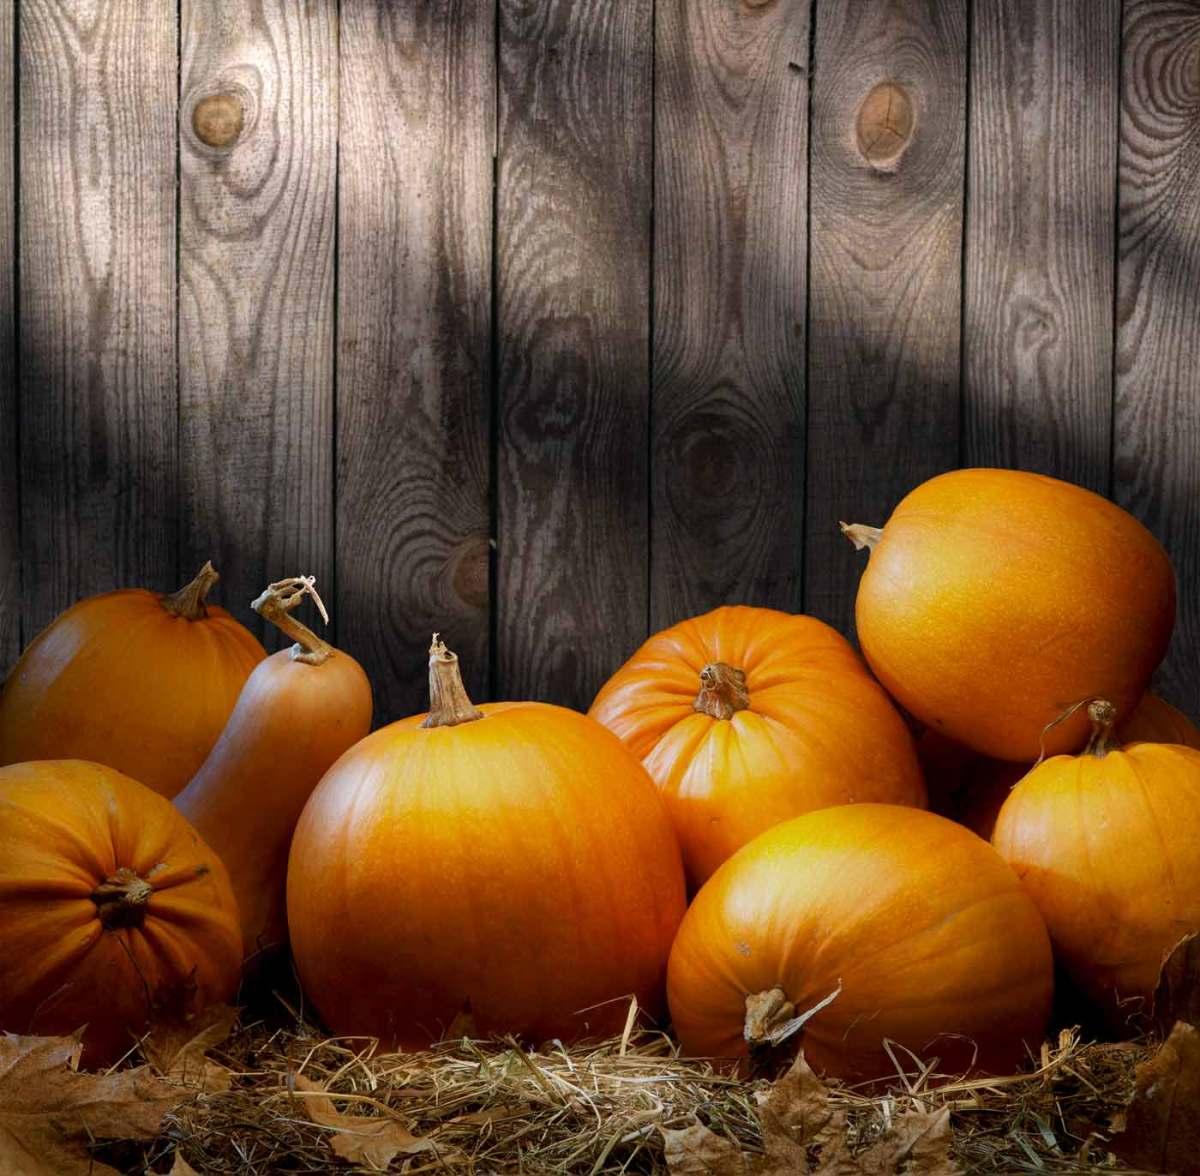 easy paleo recipes for fall